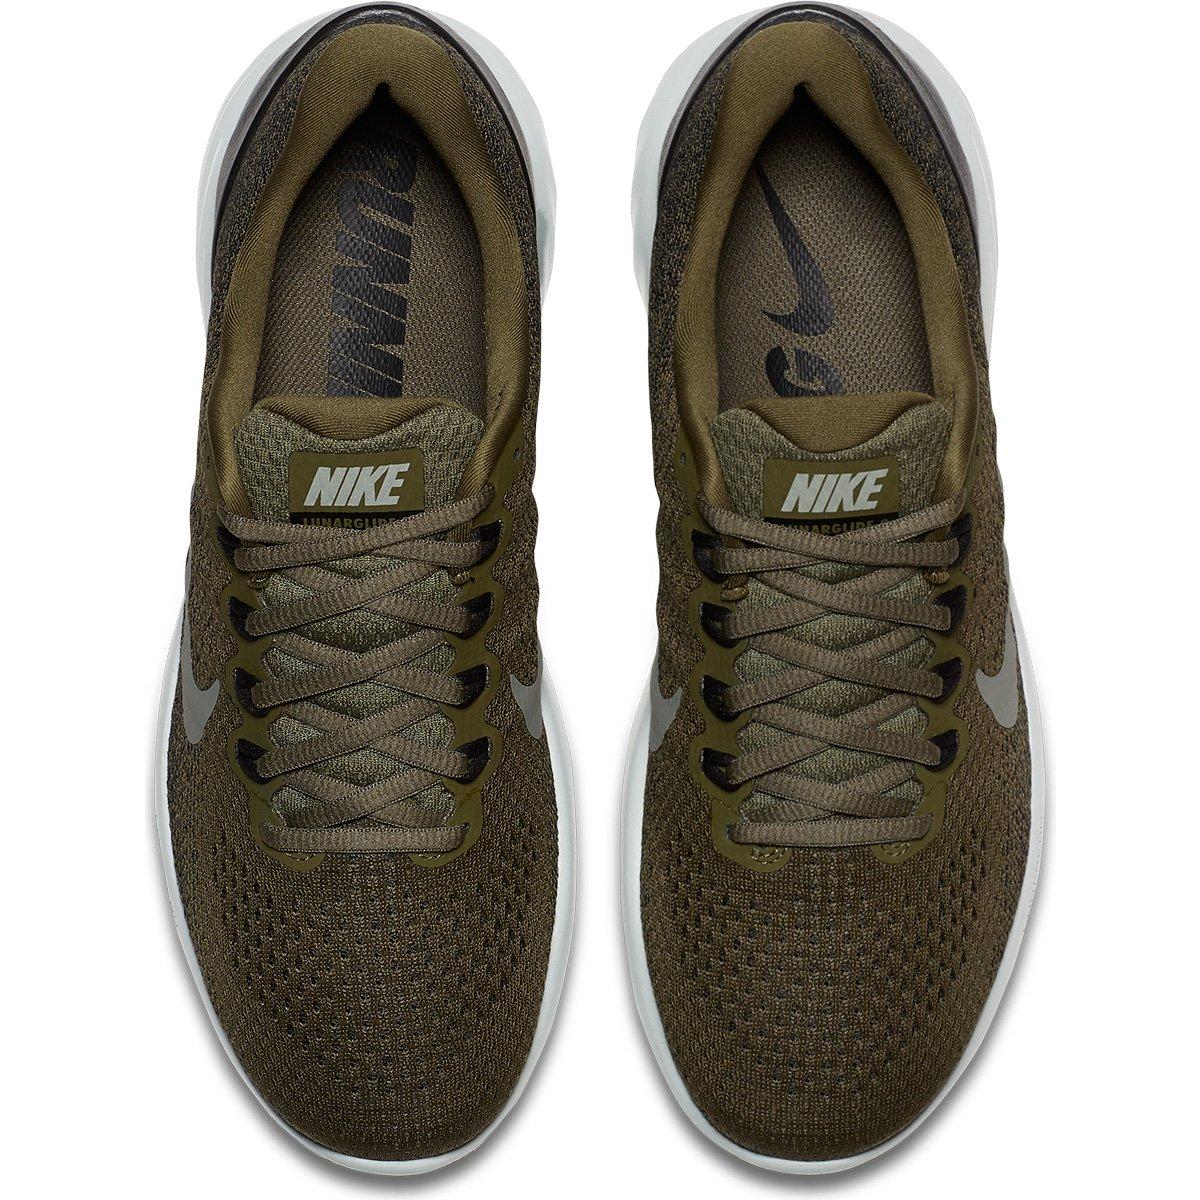 Preto 9 Nike Tênis Lunarglide Masculino Lunarglide 9 Masculino e Tênis Nike Verde 5XwRqPR